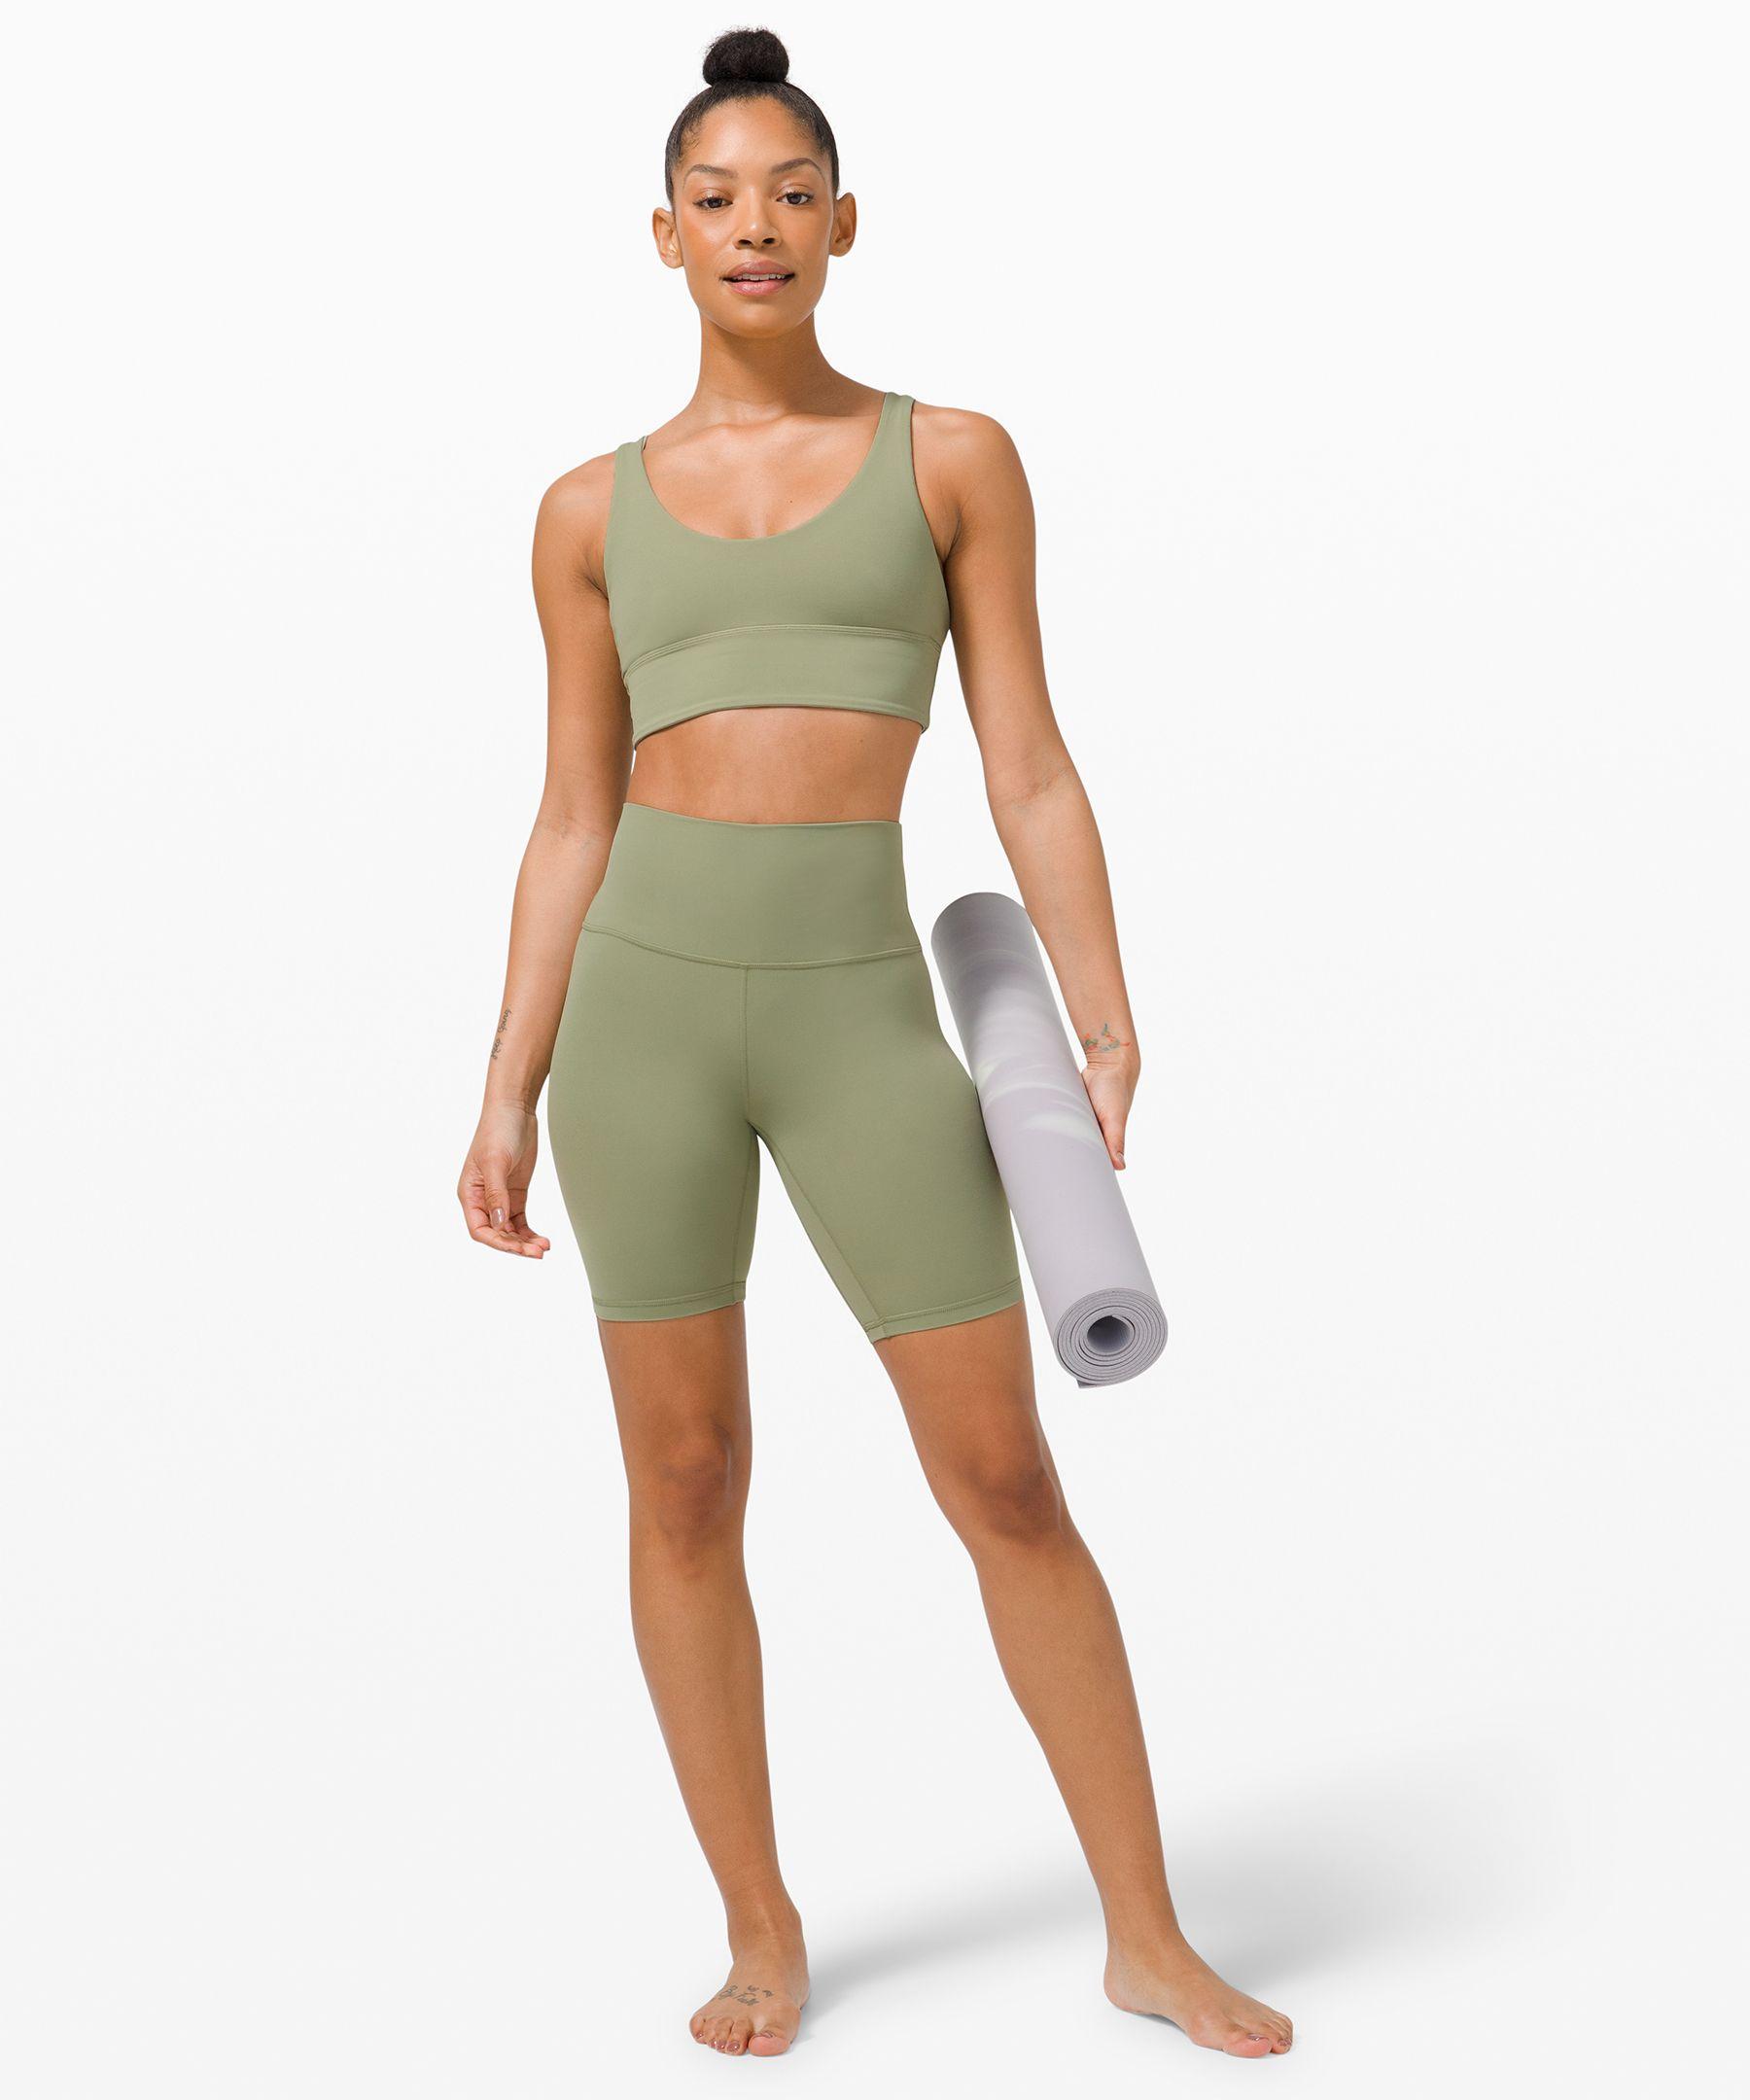 Align Shorts HB 20cm